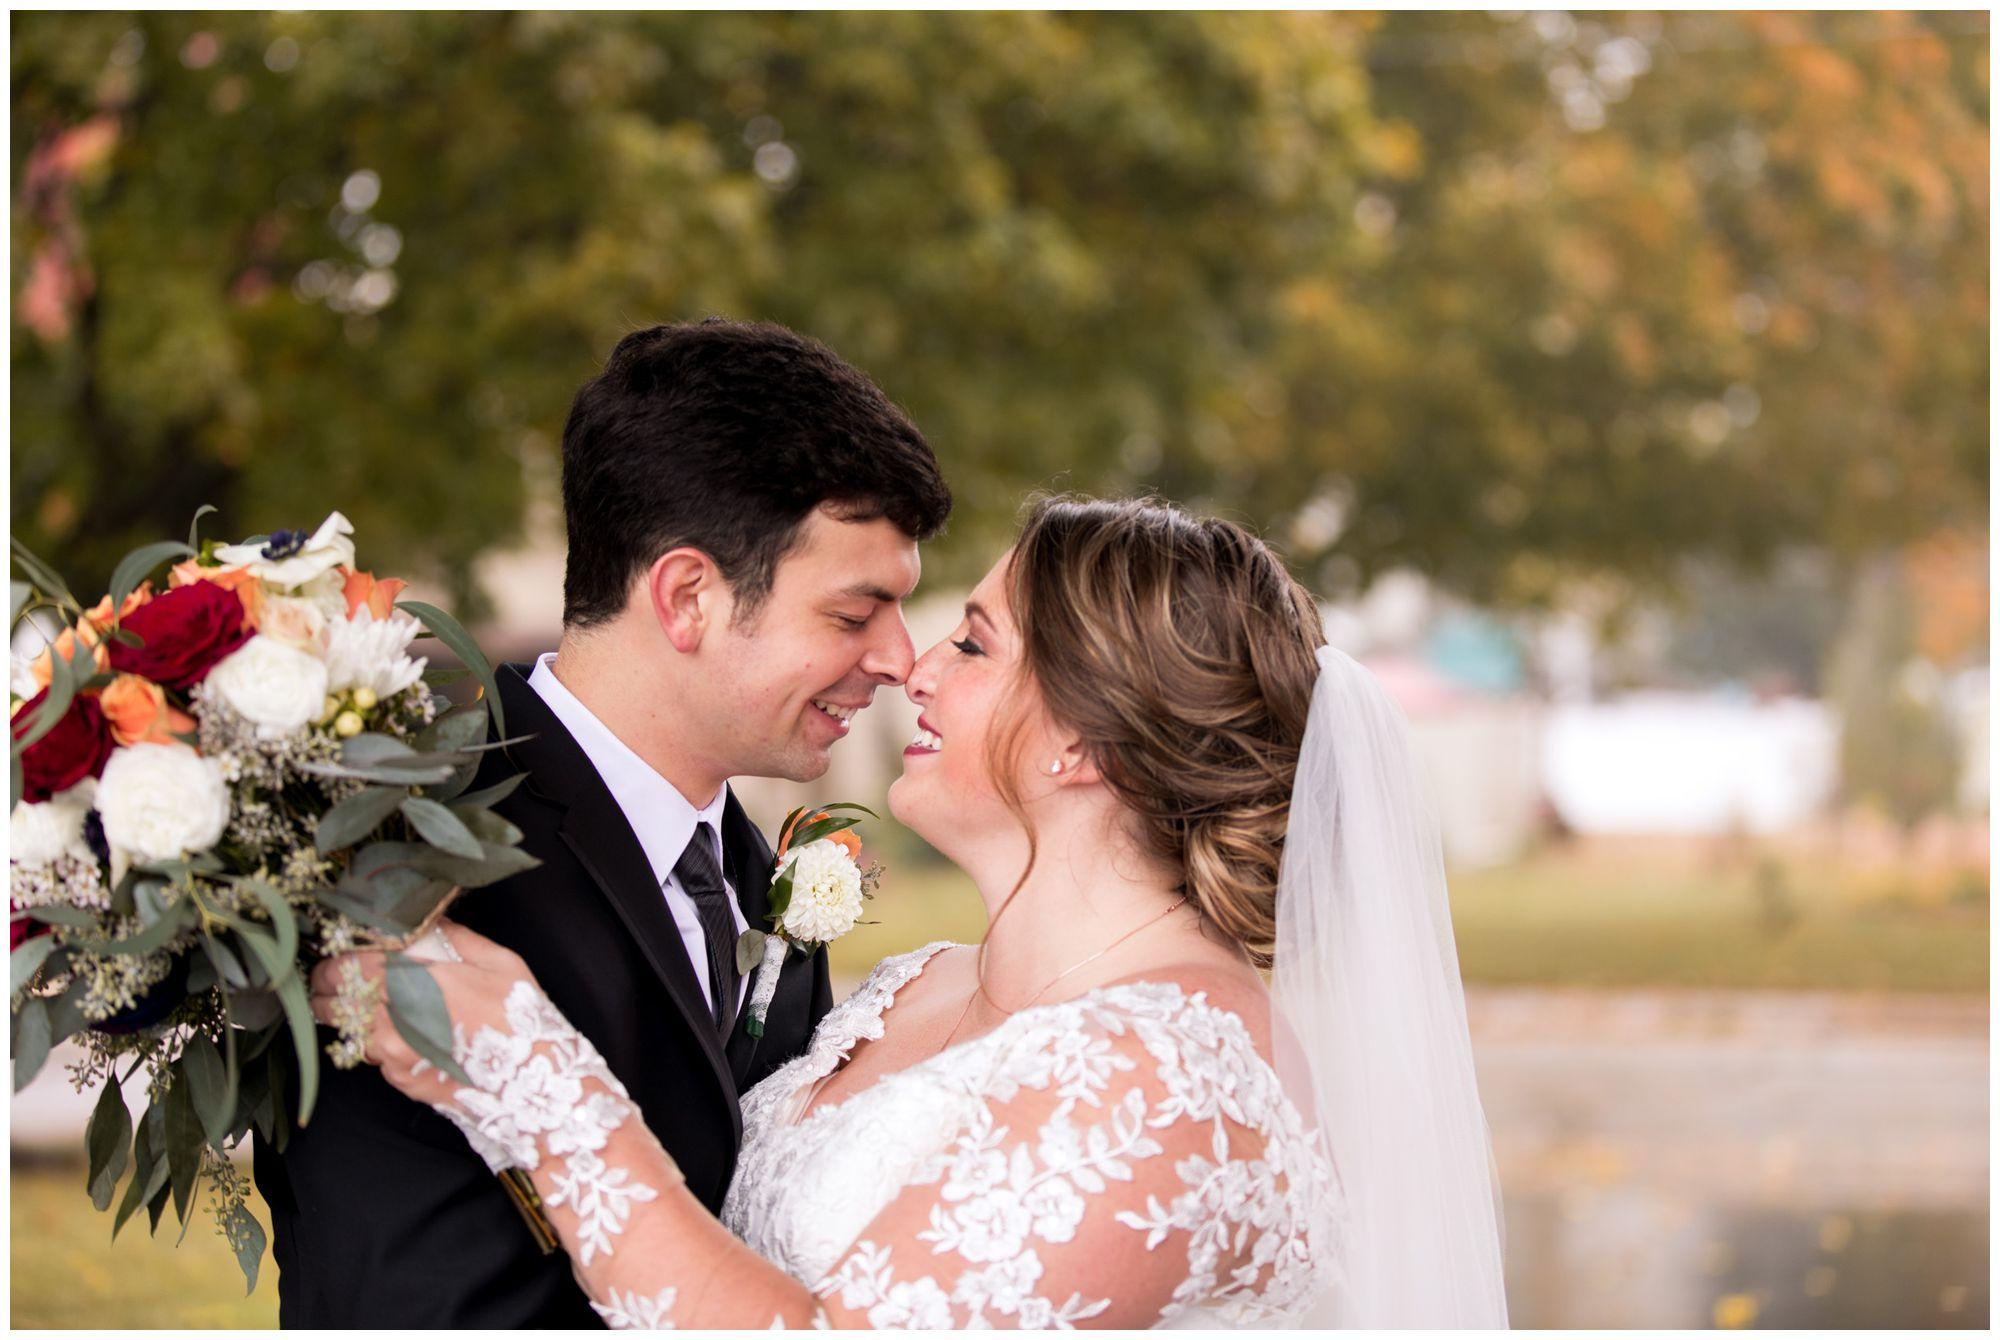 bride and groom wedding photos in Decatur Indiana